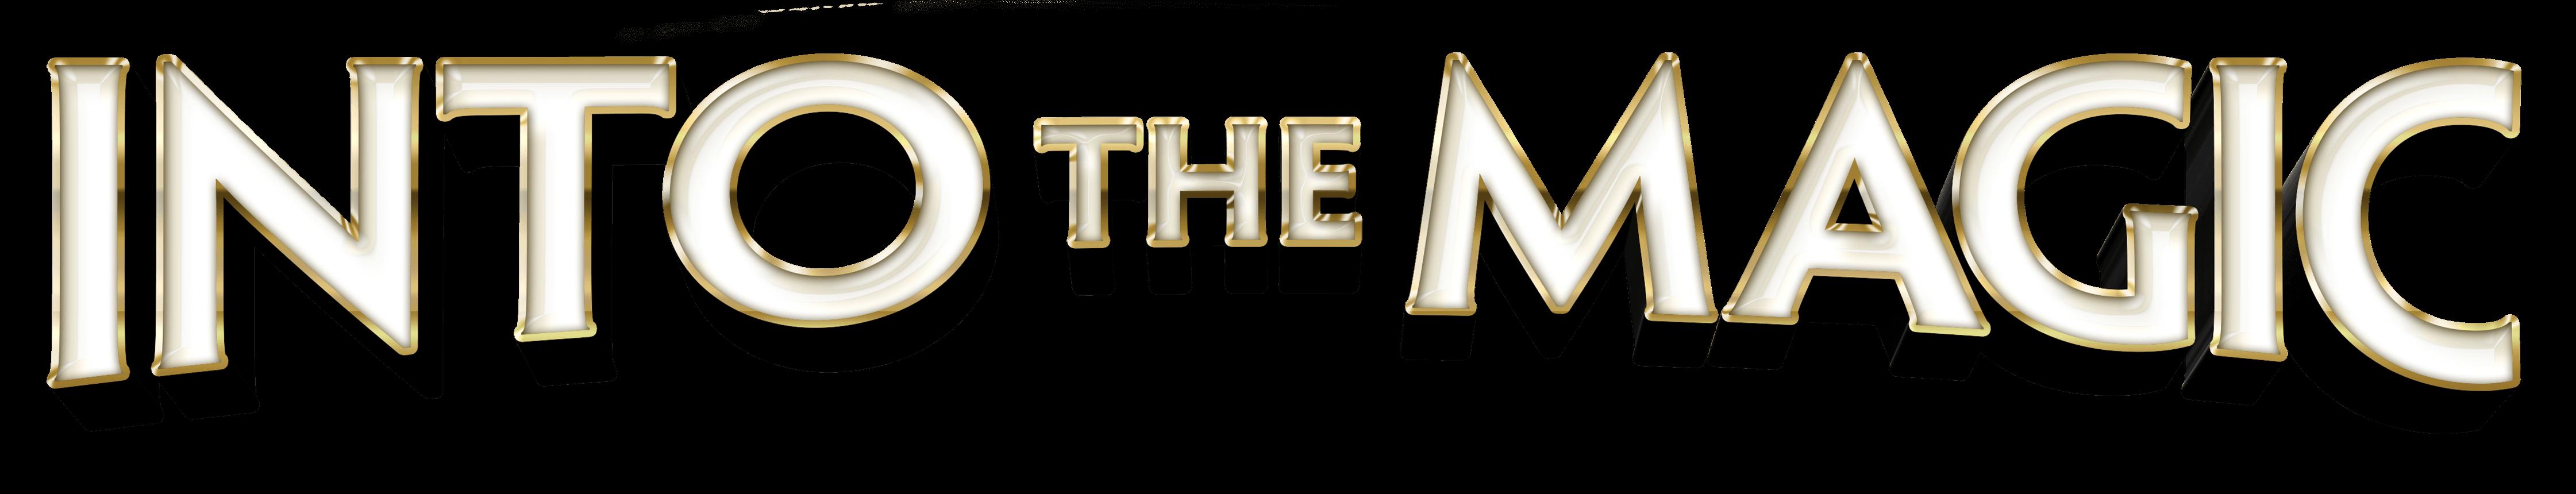 Into the Magic logo